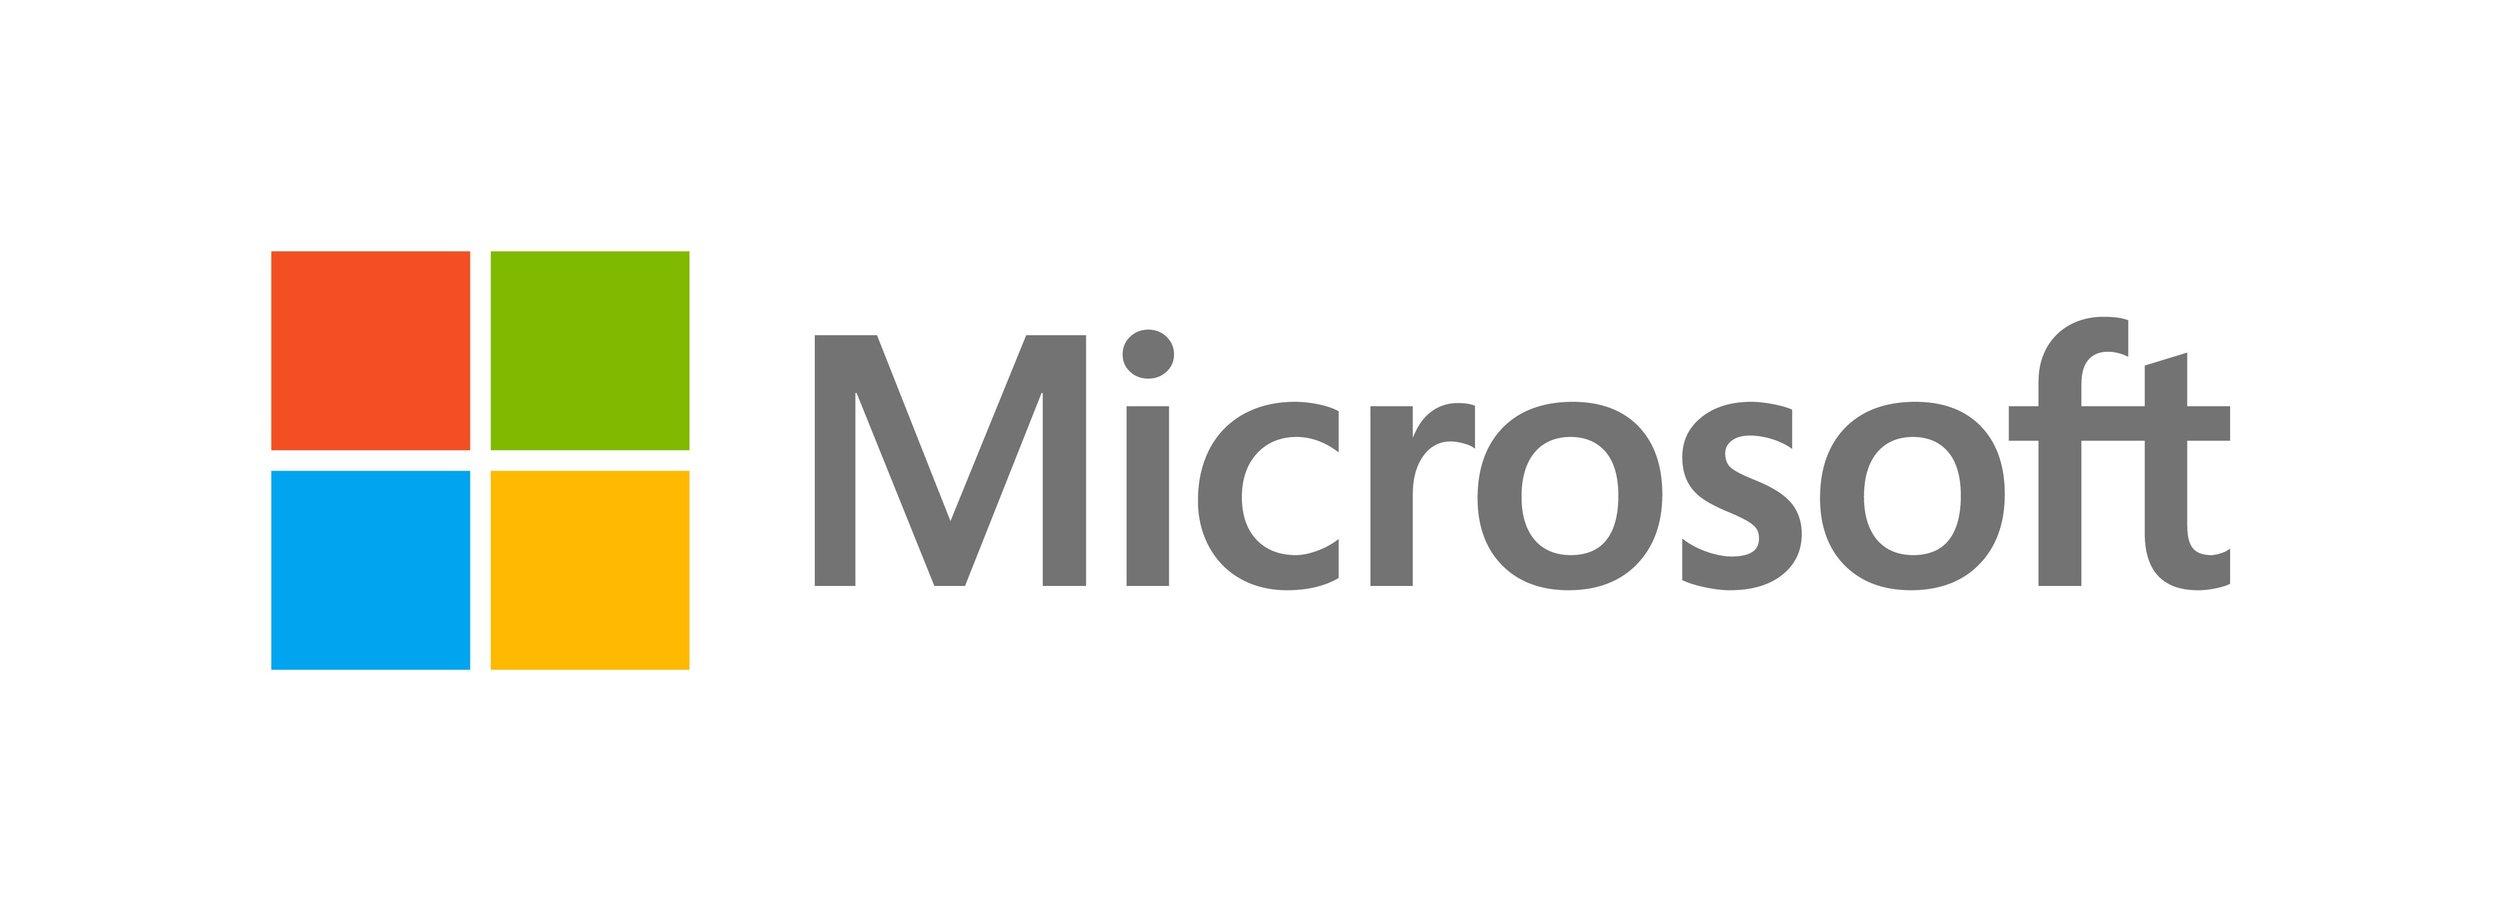 8867.Microsoft_5F00_Logo_2D00_for_2D00_screen (1).jpg